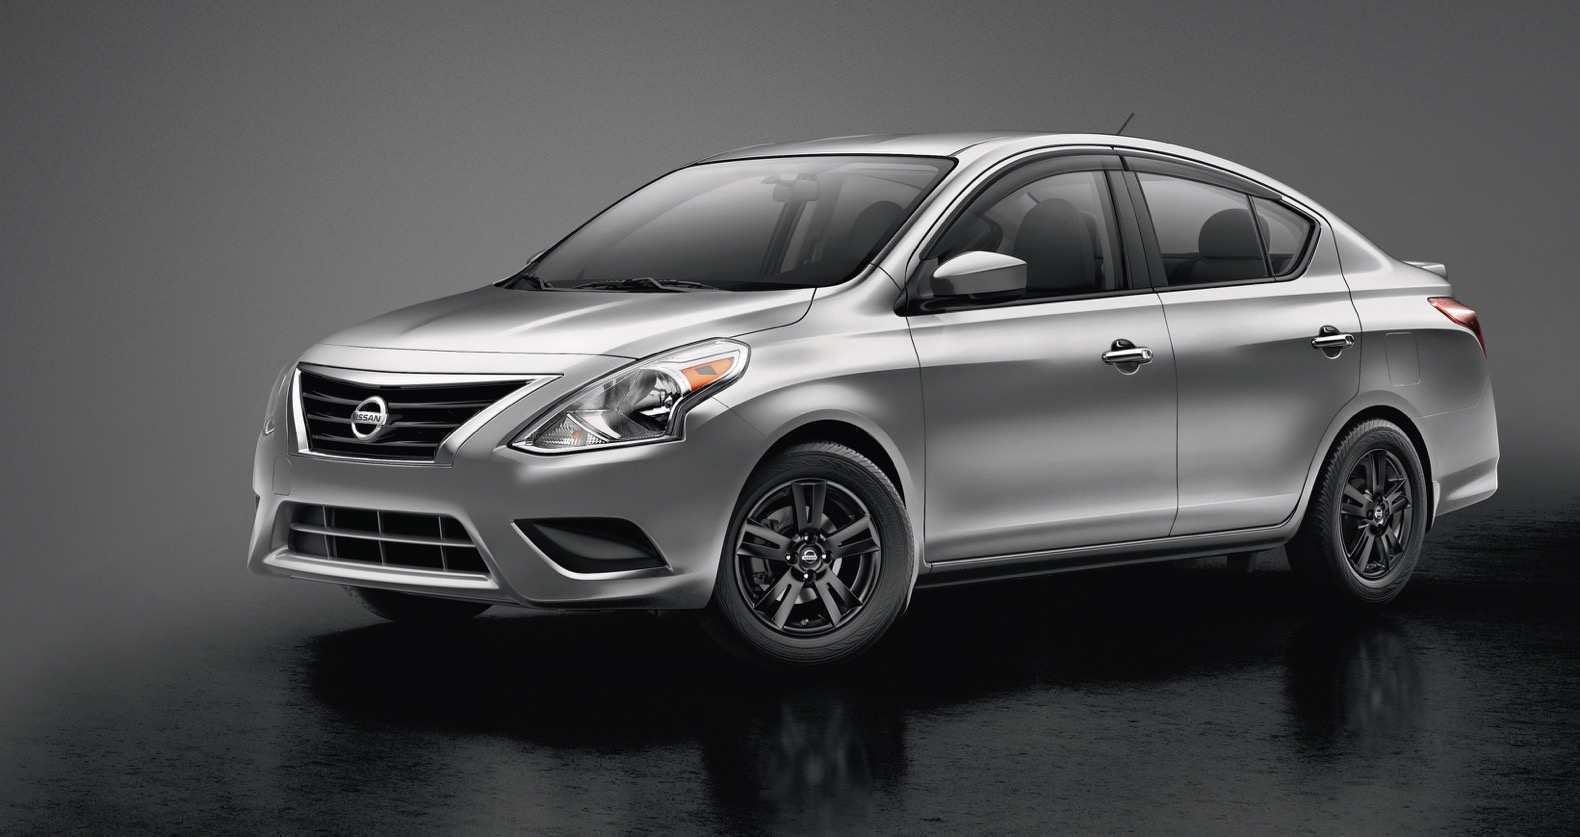 23 Concept of Nissan Versa 2020 New Concept Spesification for Nissan Versa 2020 New Concept